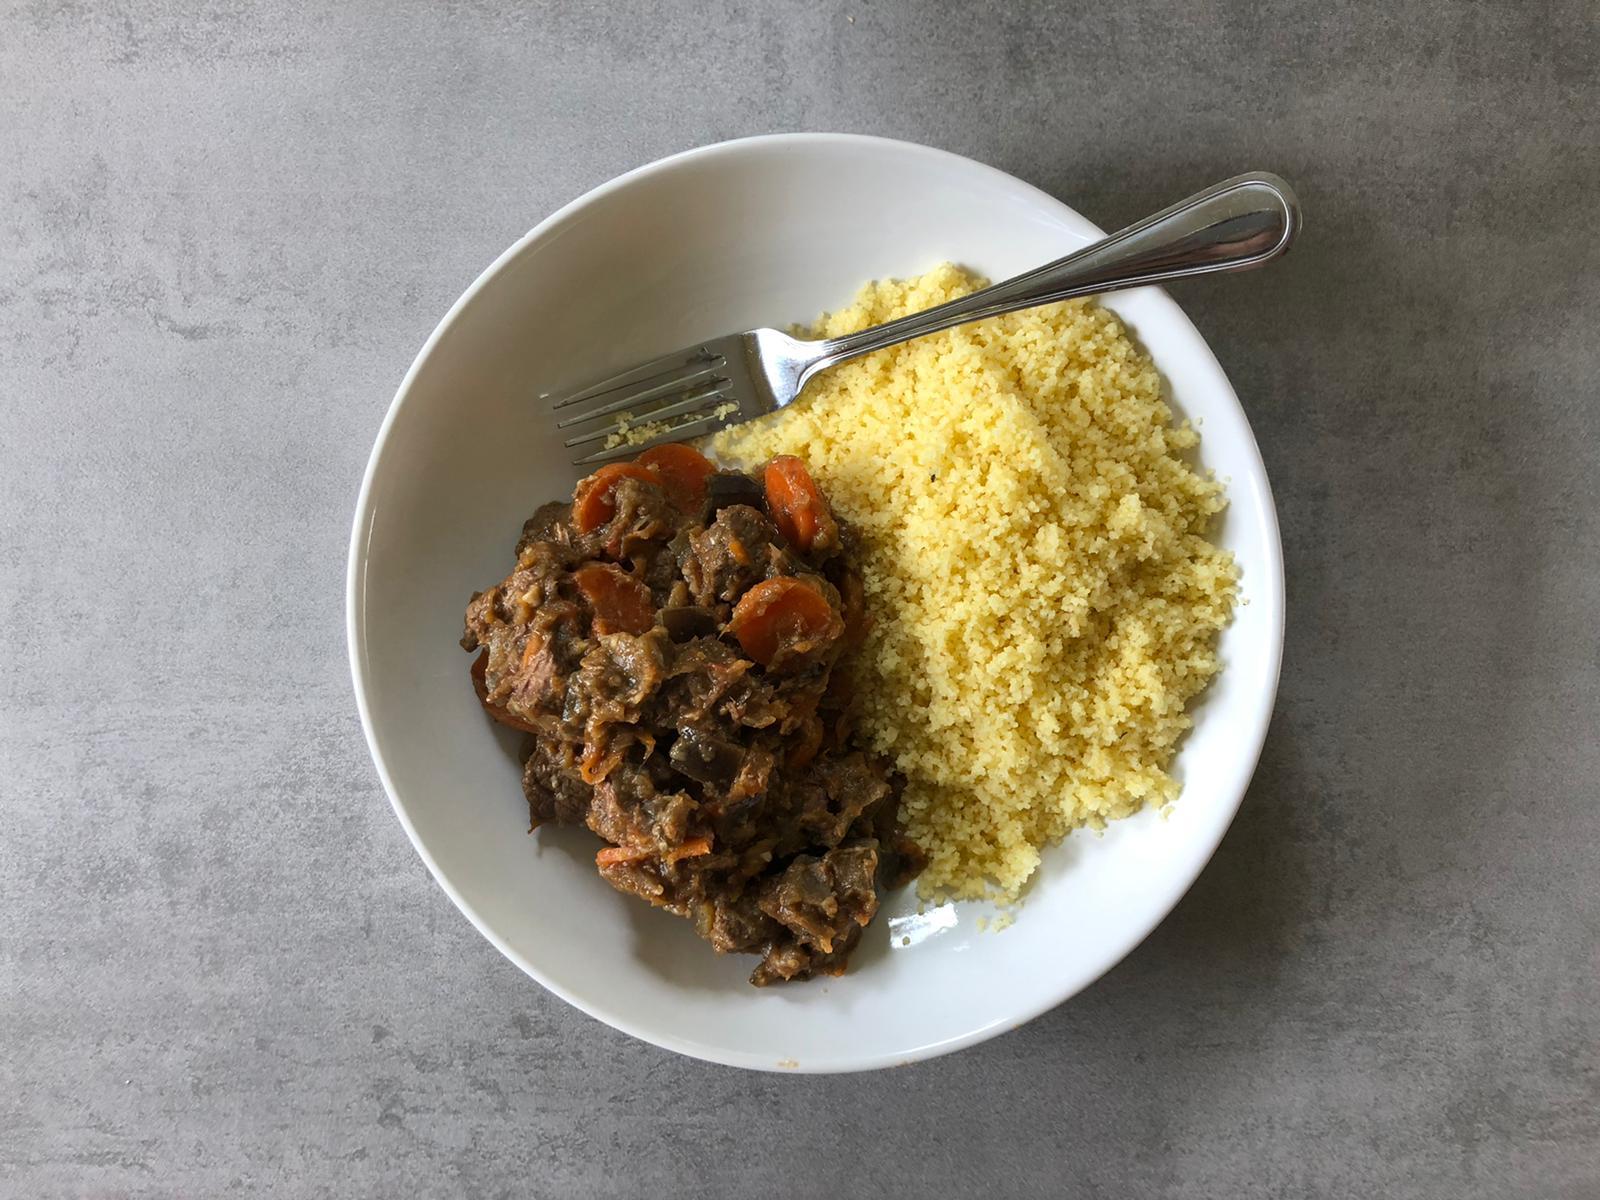 Marokkaanse stoof met couscous